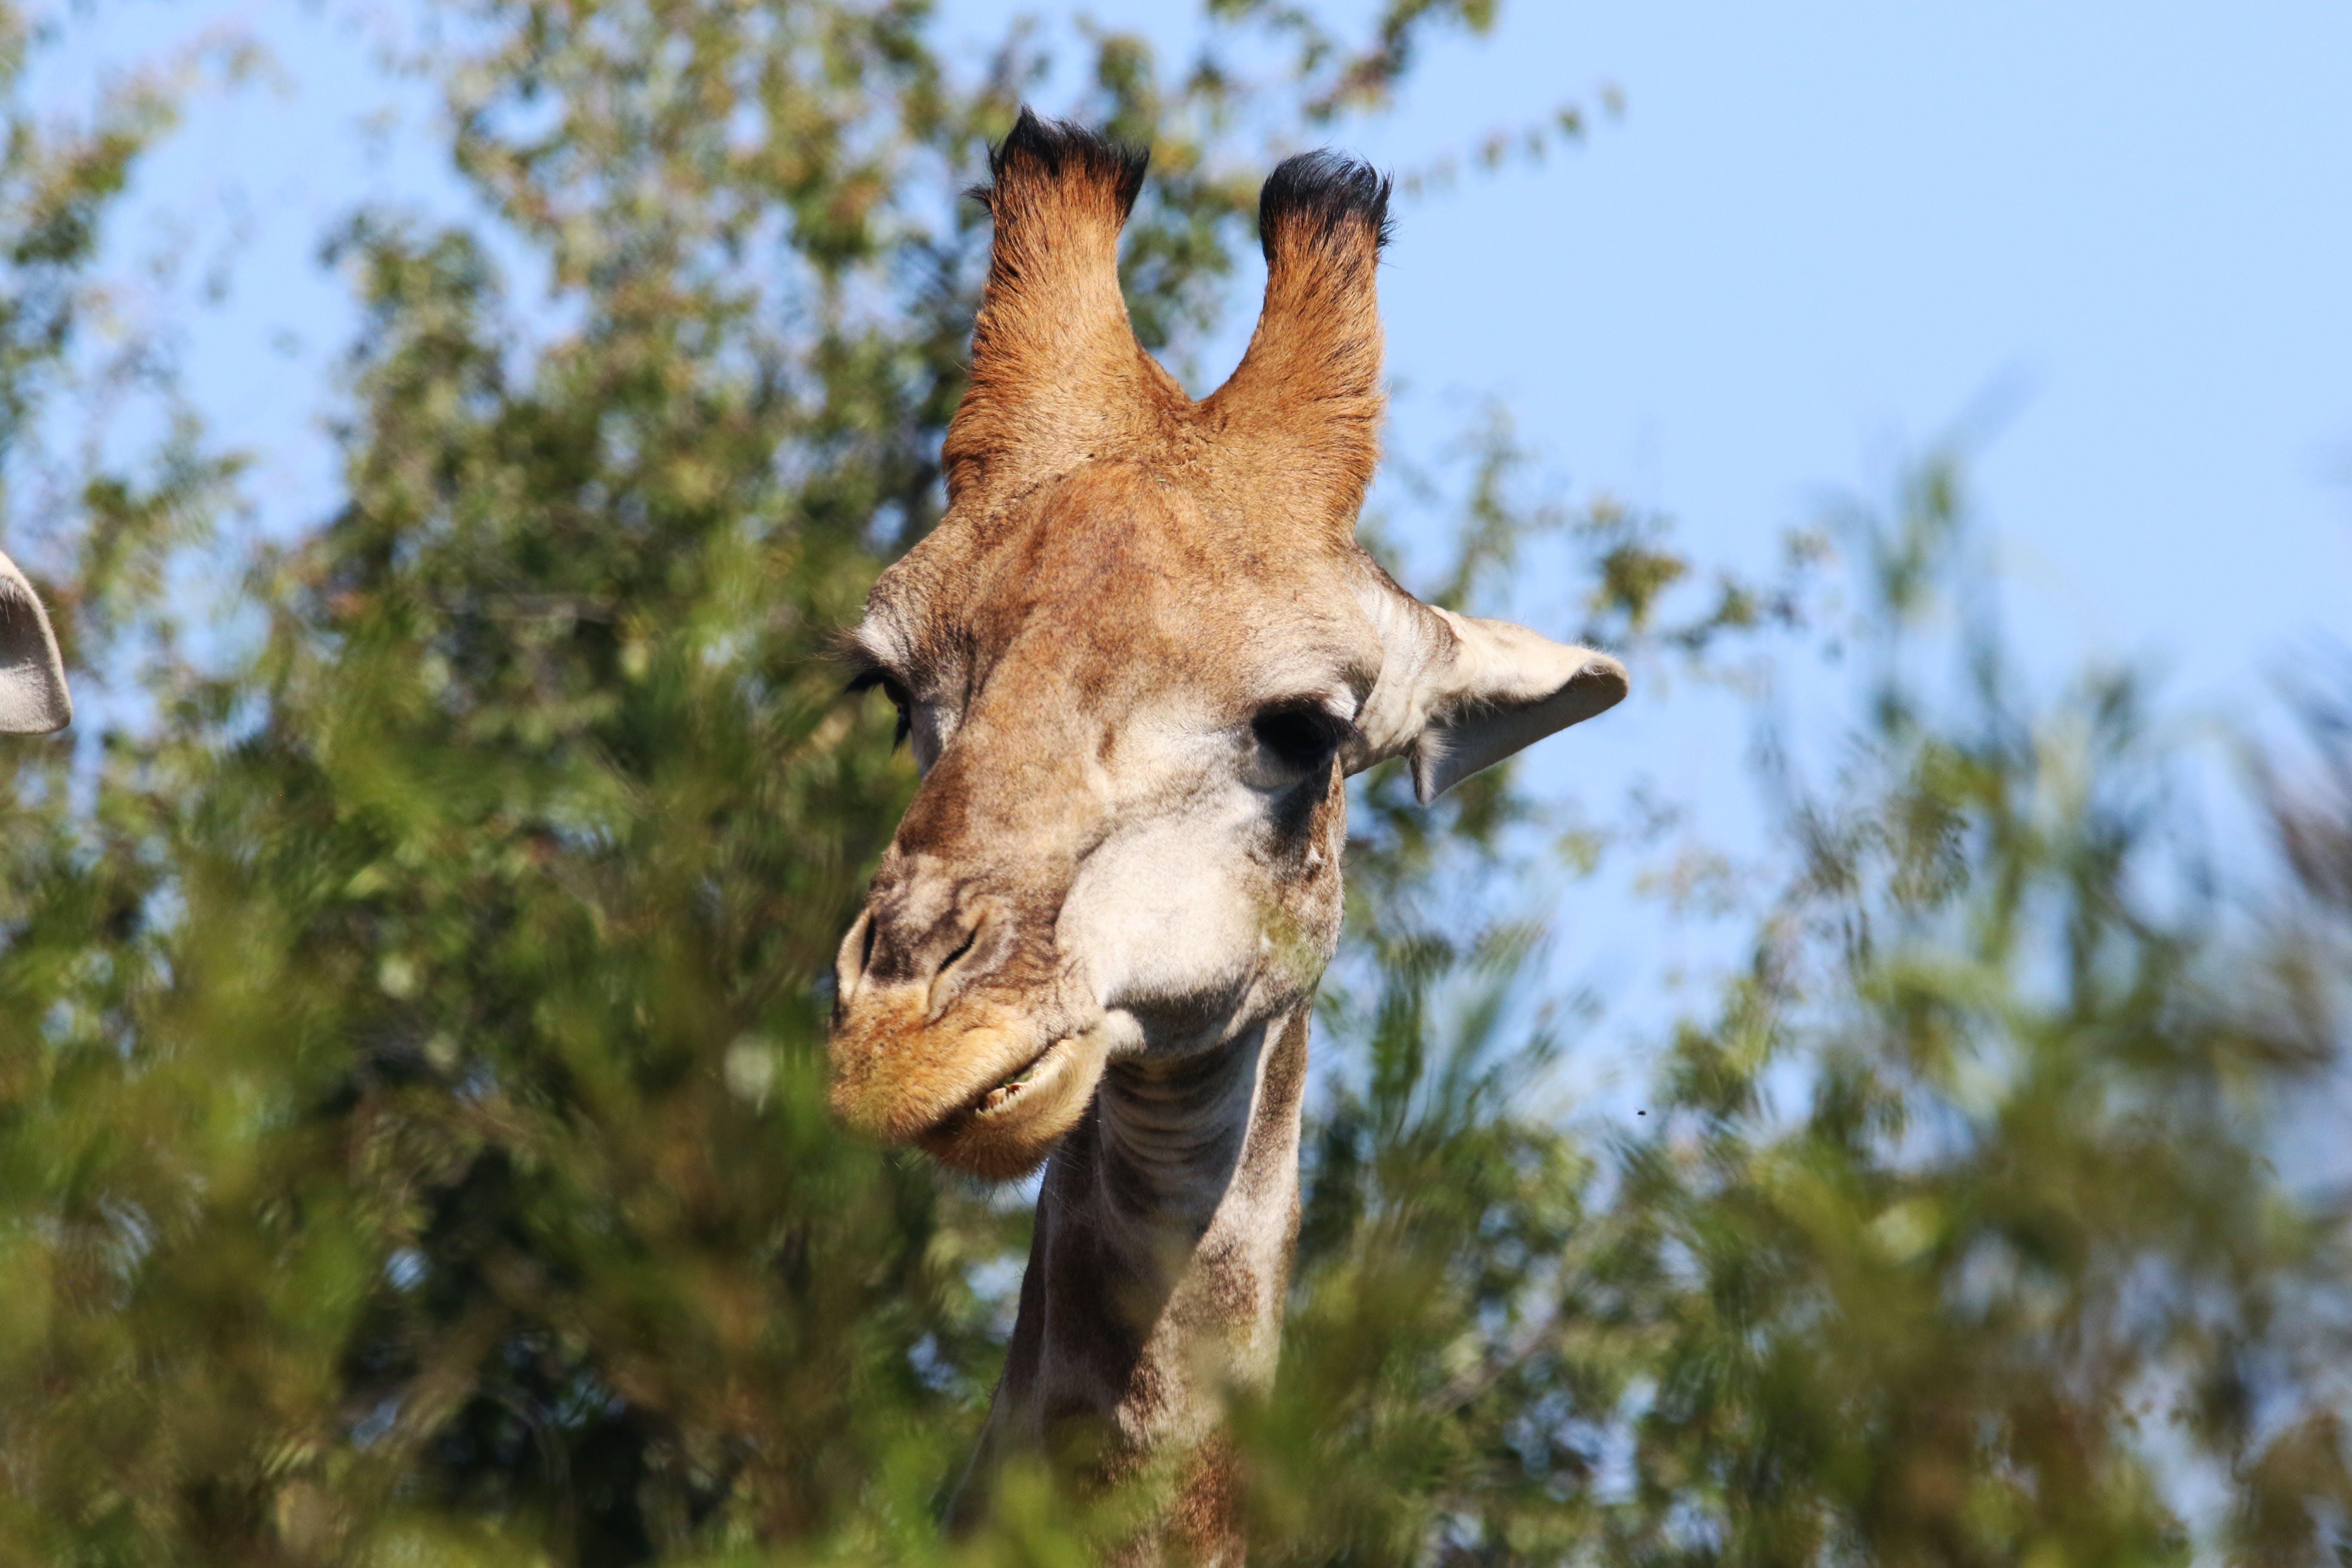 Closeup Photo of Brown Giraffe